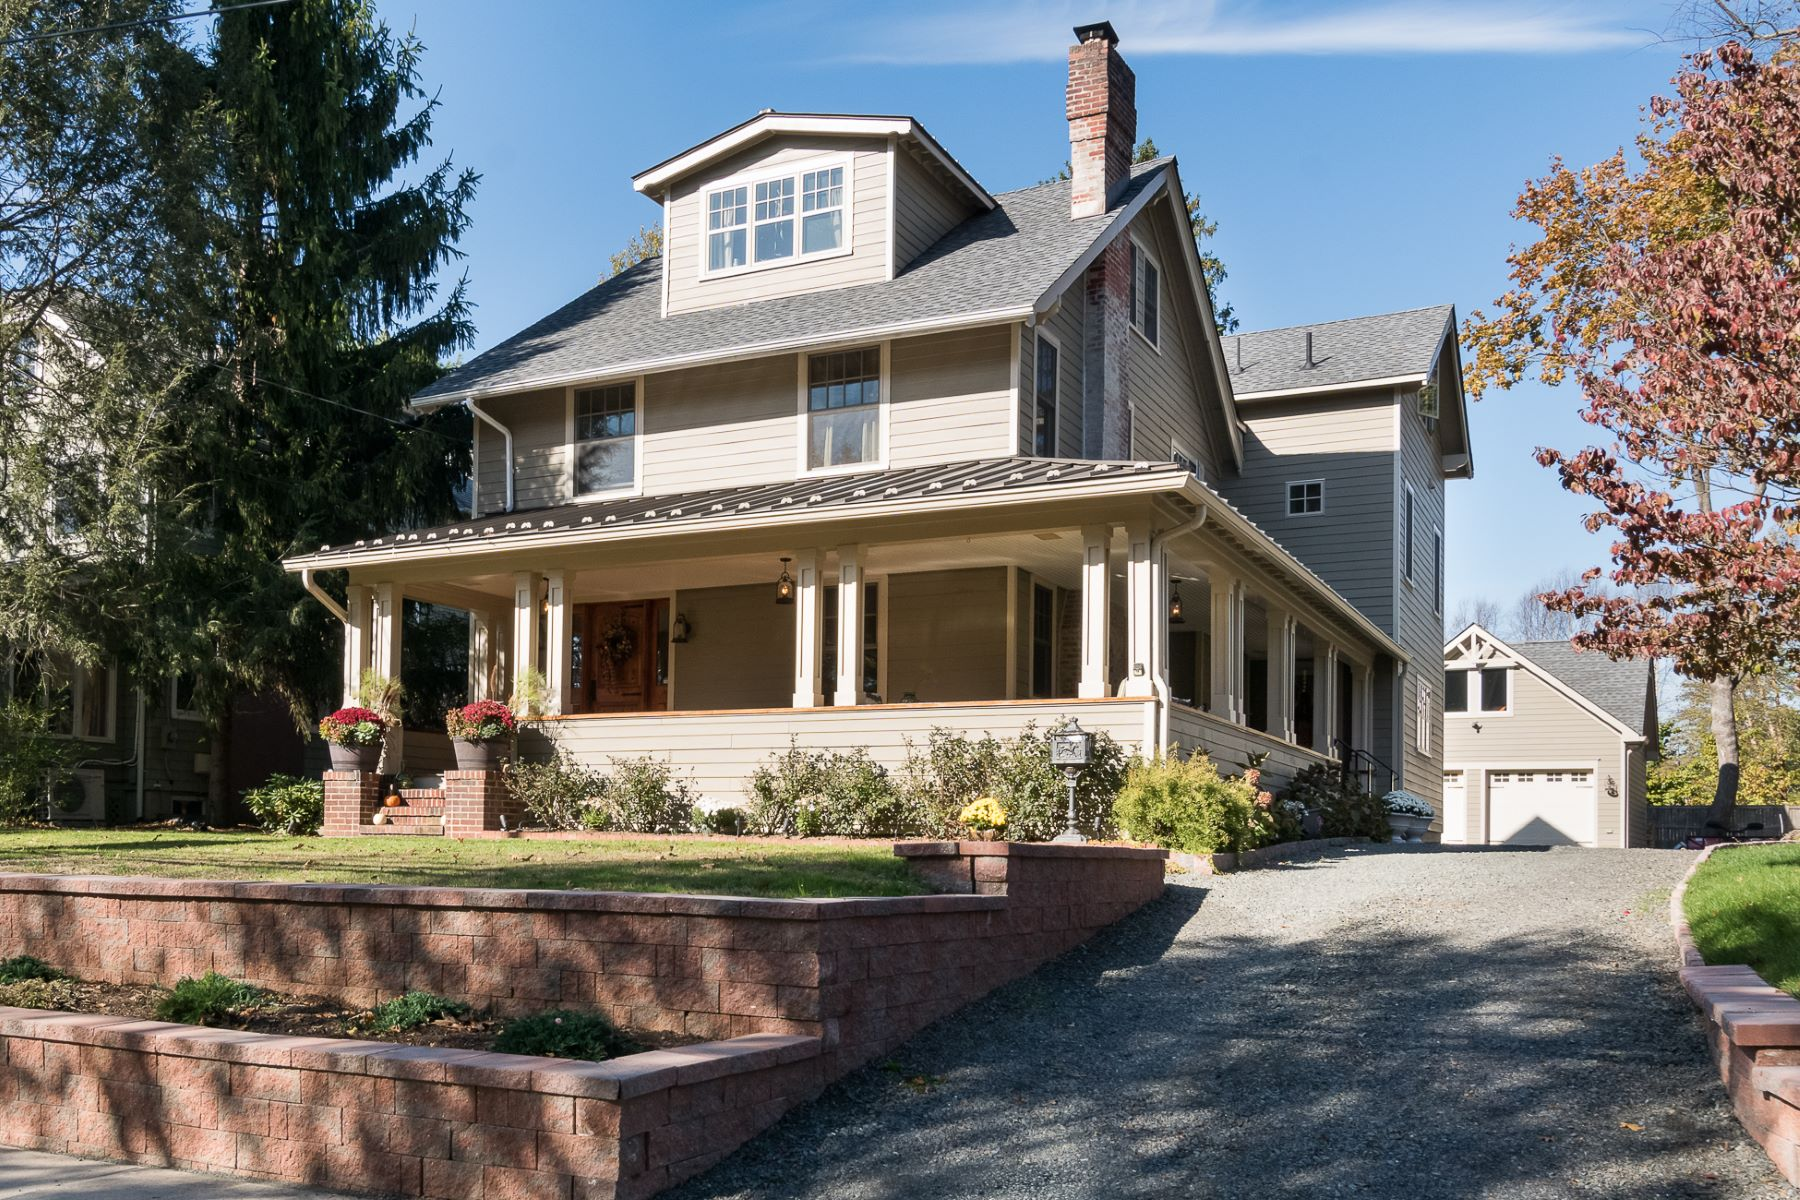 Single Family Homes のために 売買 アット Heart of the Borough Location 15 Ingleside Avenue, Pennington, ニュージャージー 08534 アメリカ